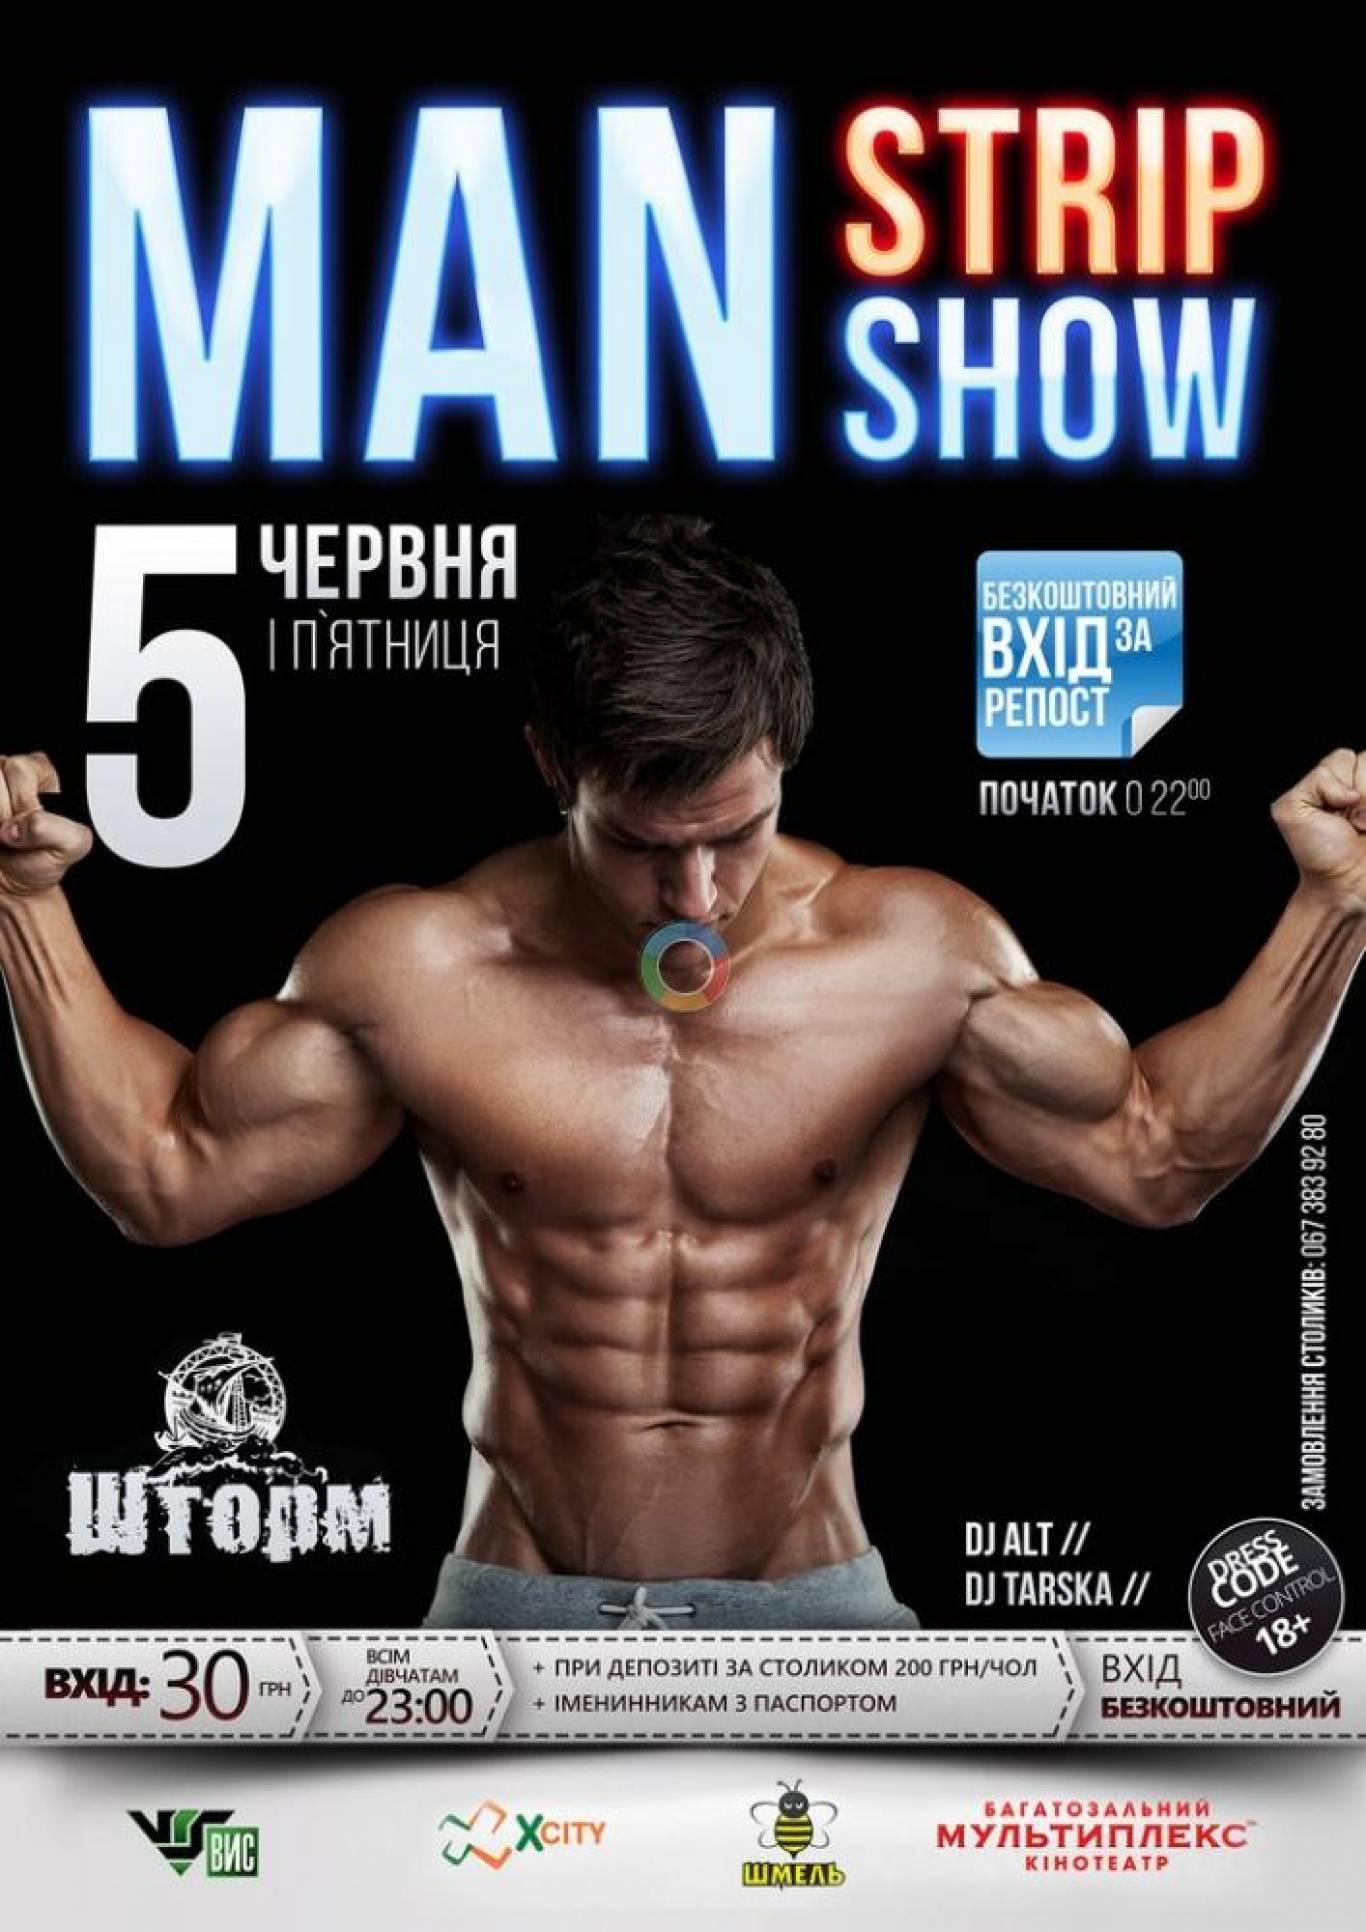 Man strip show